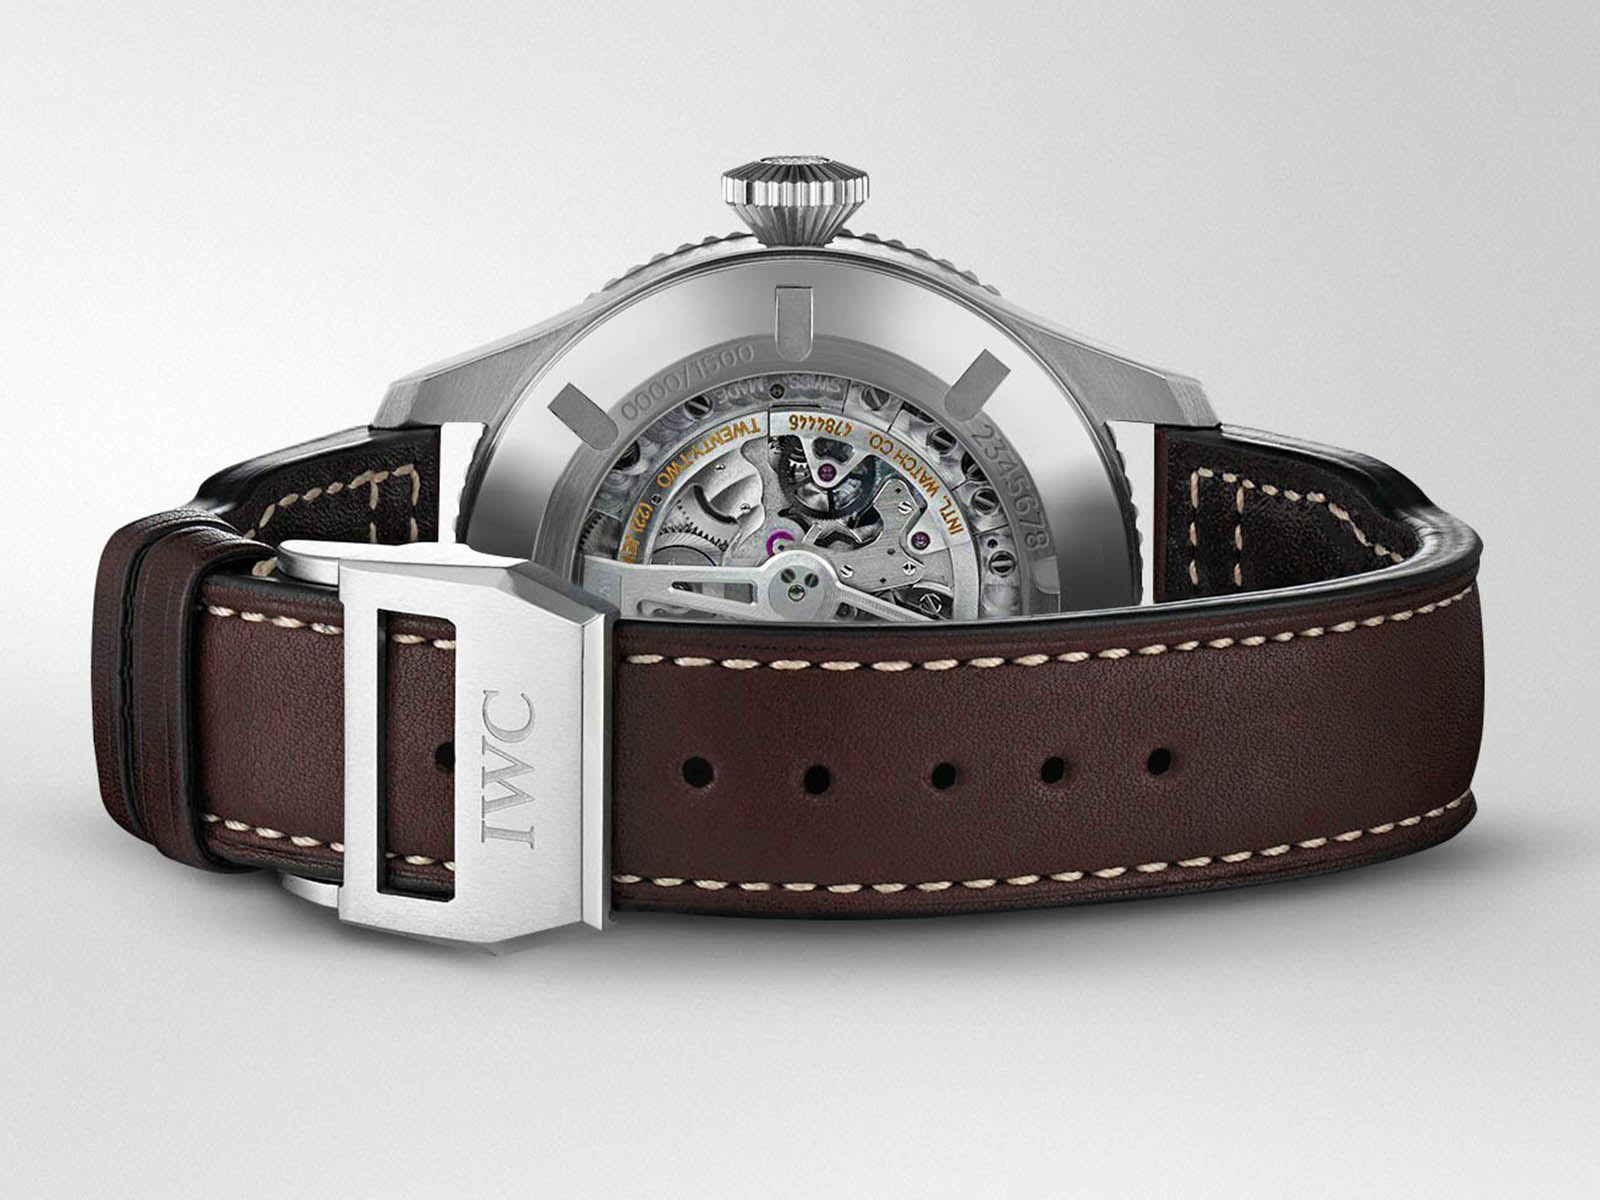 iw395503-iwc-pilot-s-watch-timezoner-edition-le-petit-prince-7.jpg